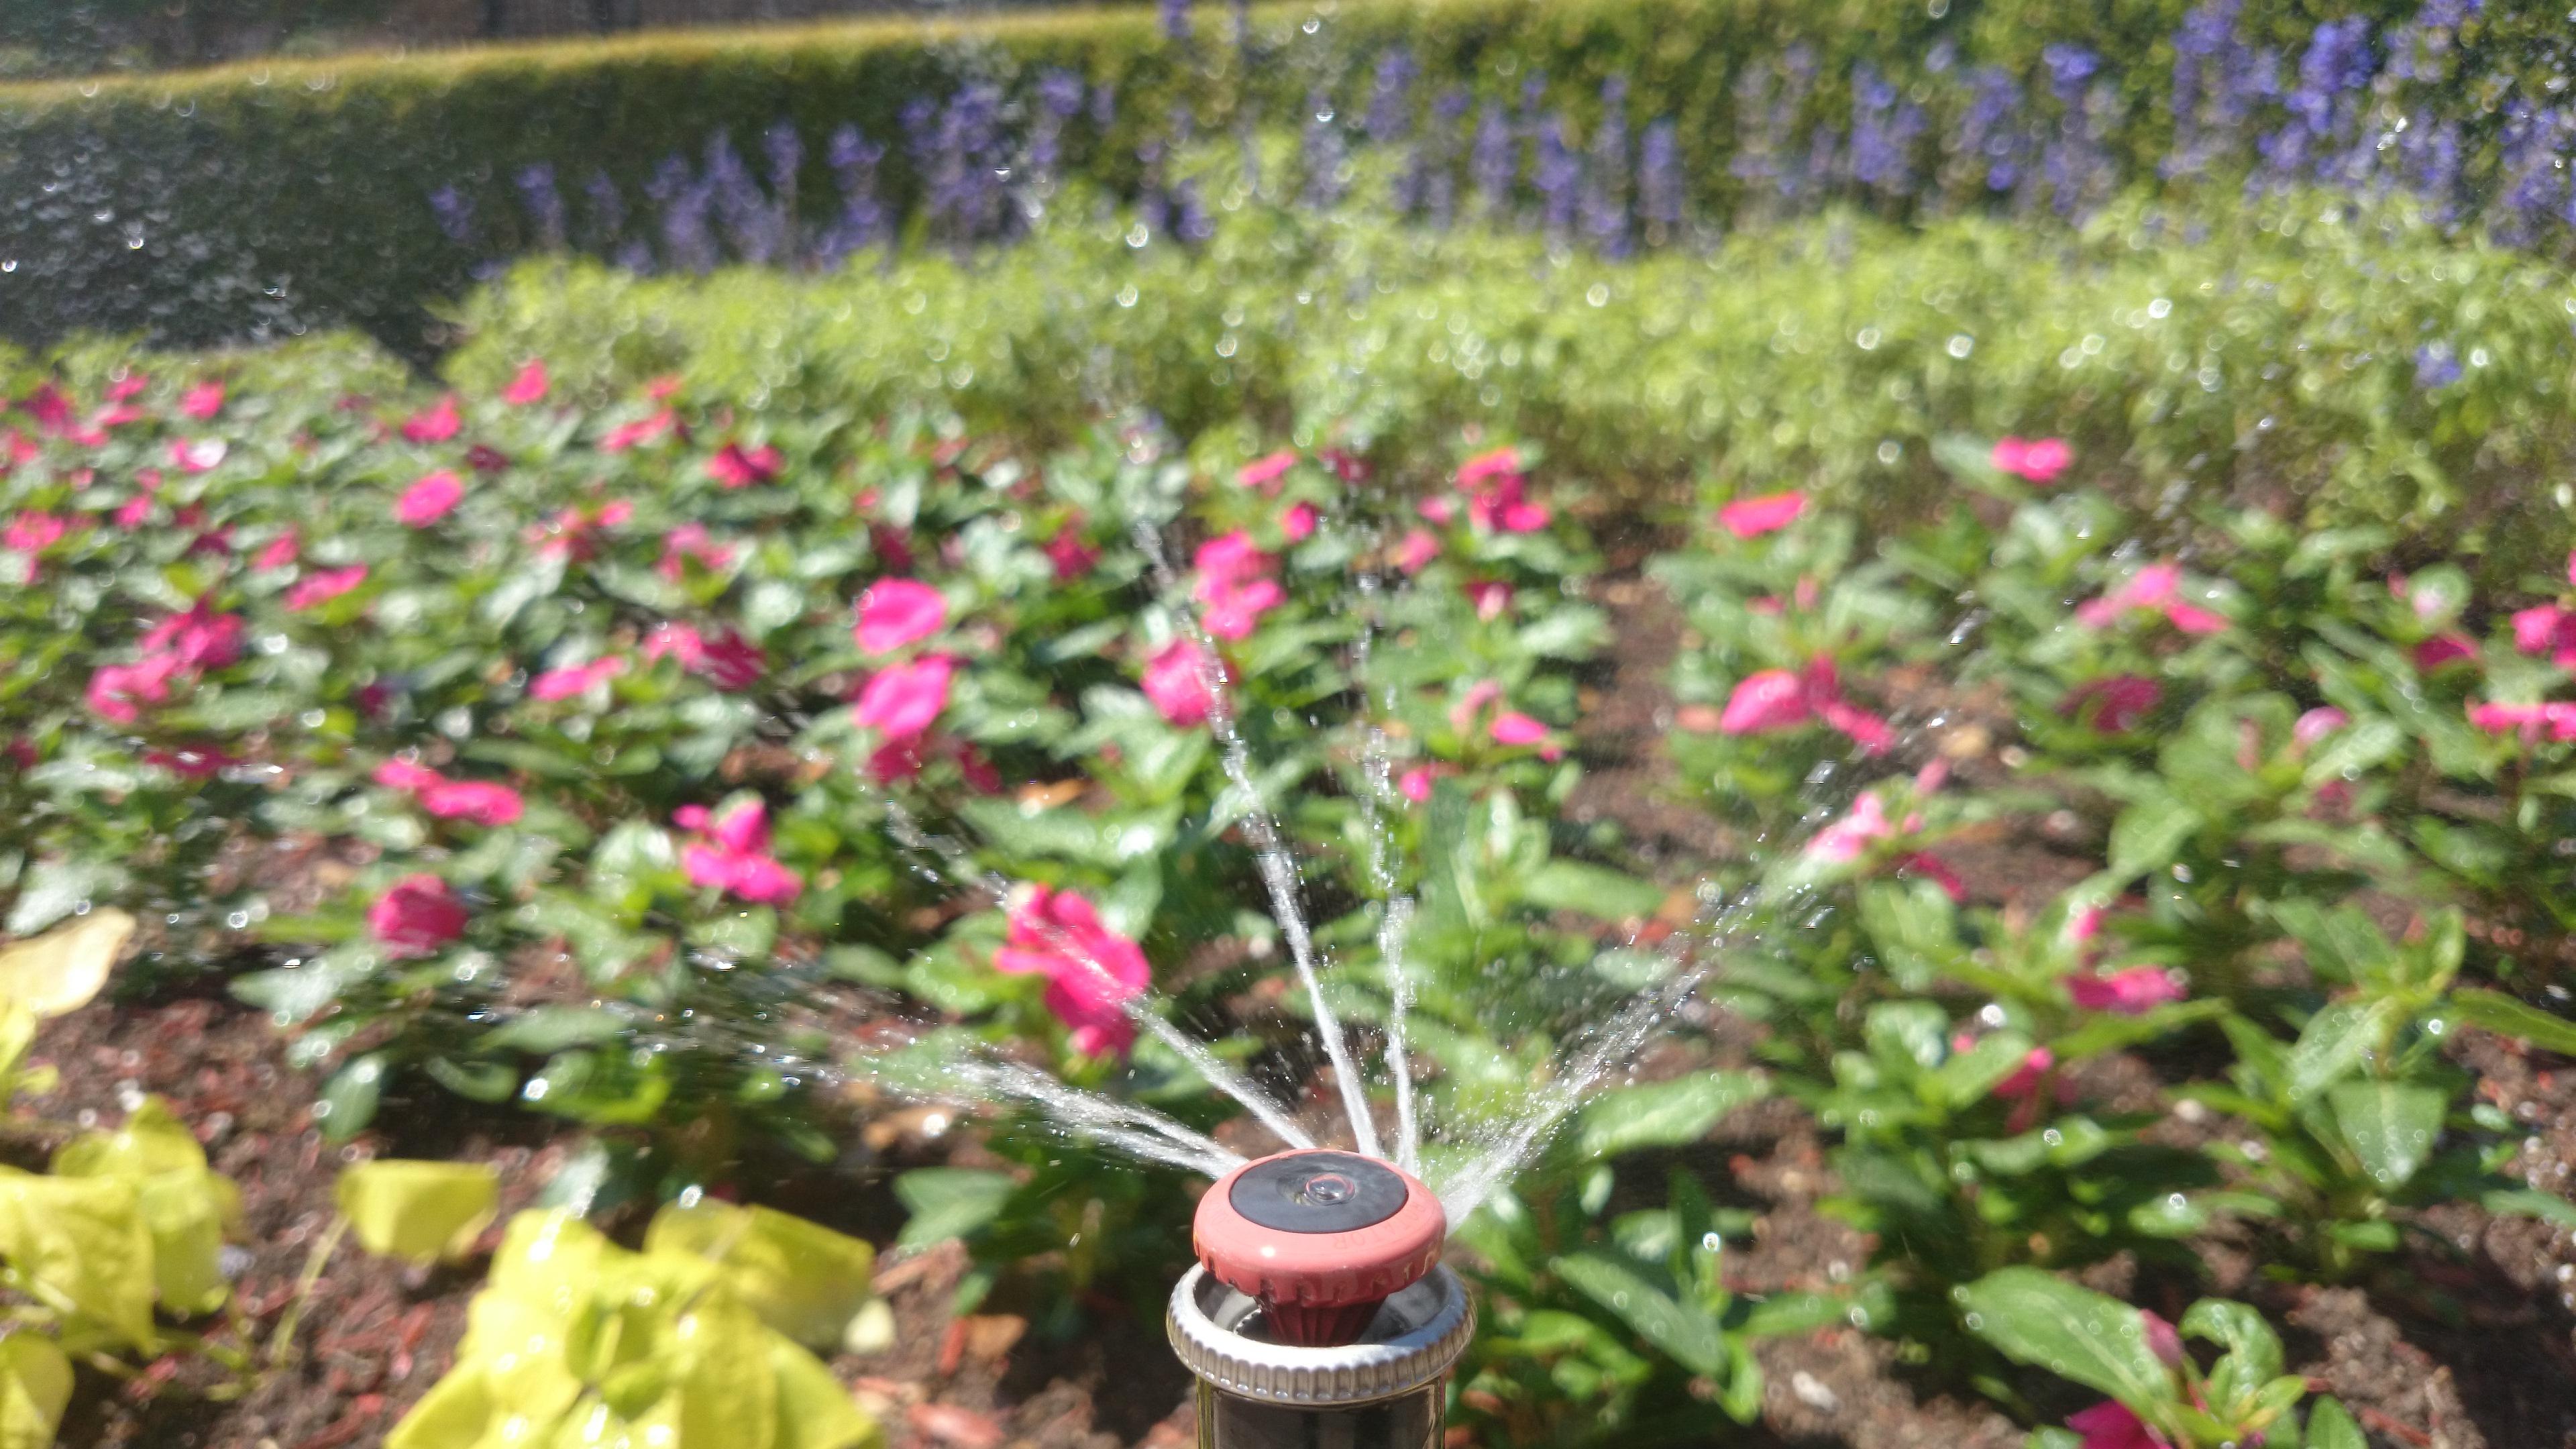 GreatWater Irrigation